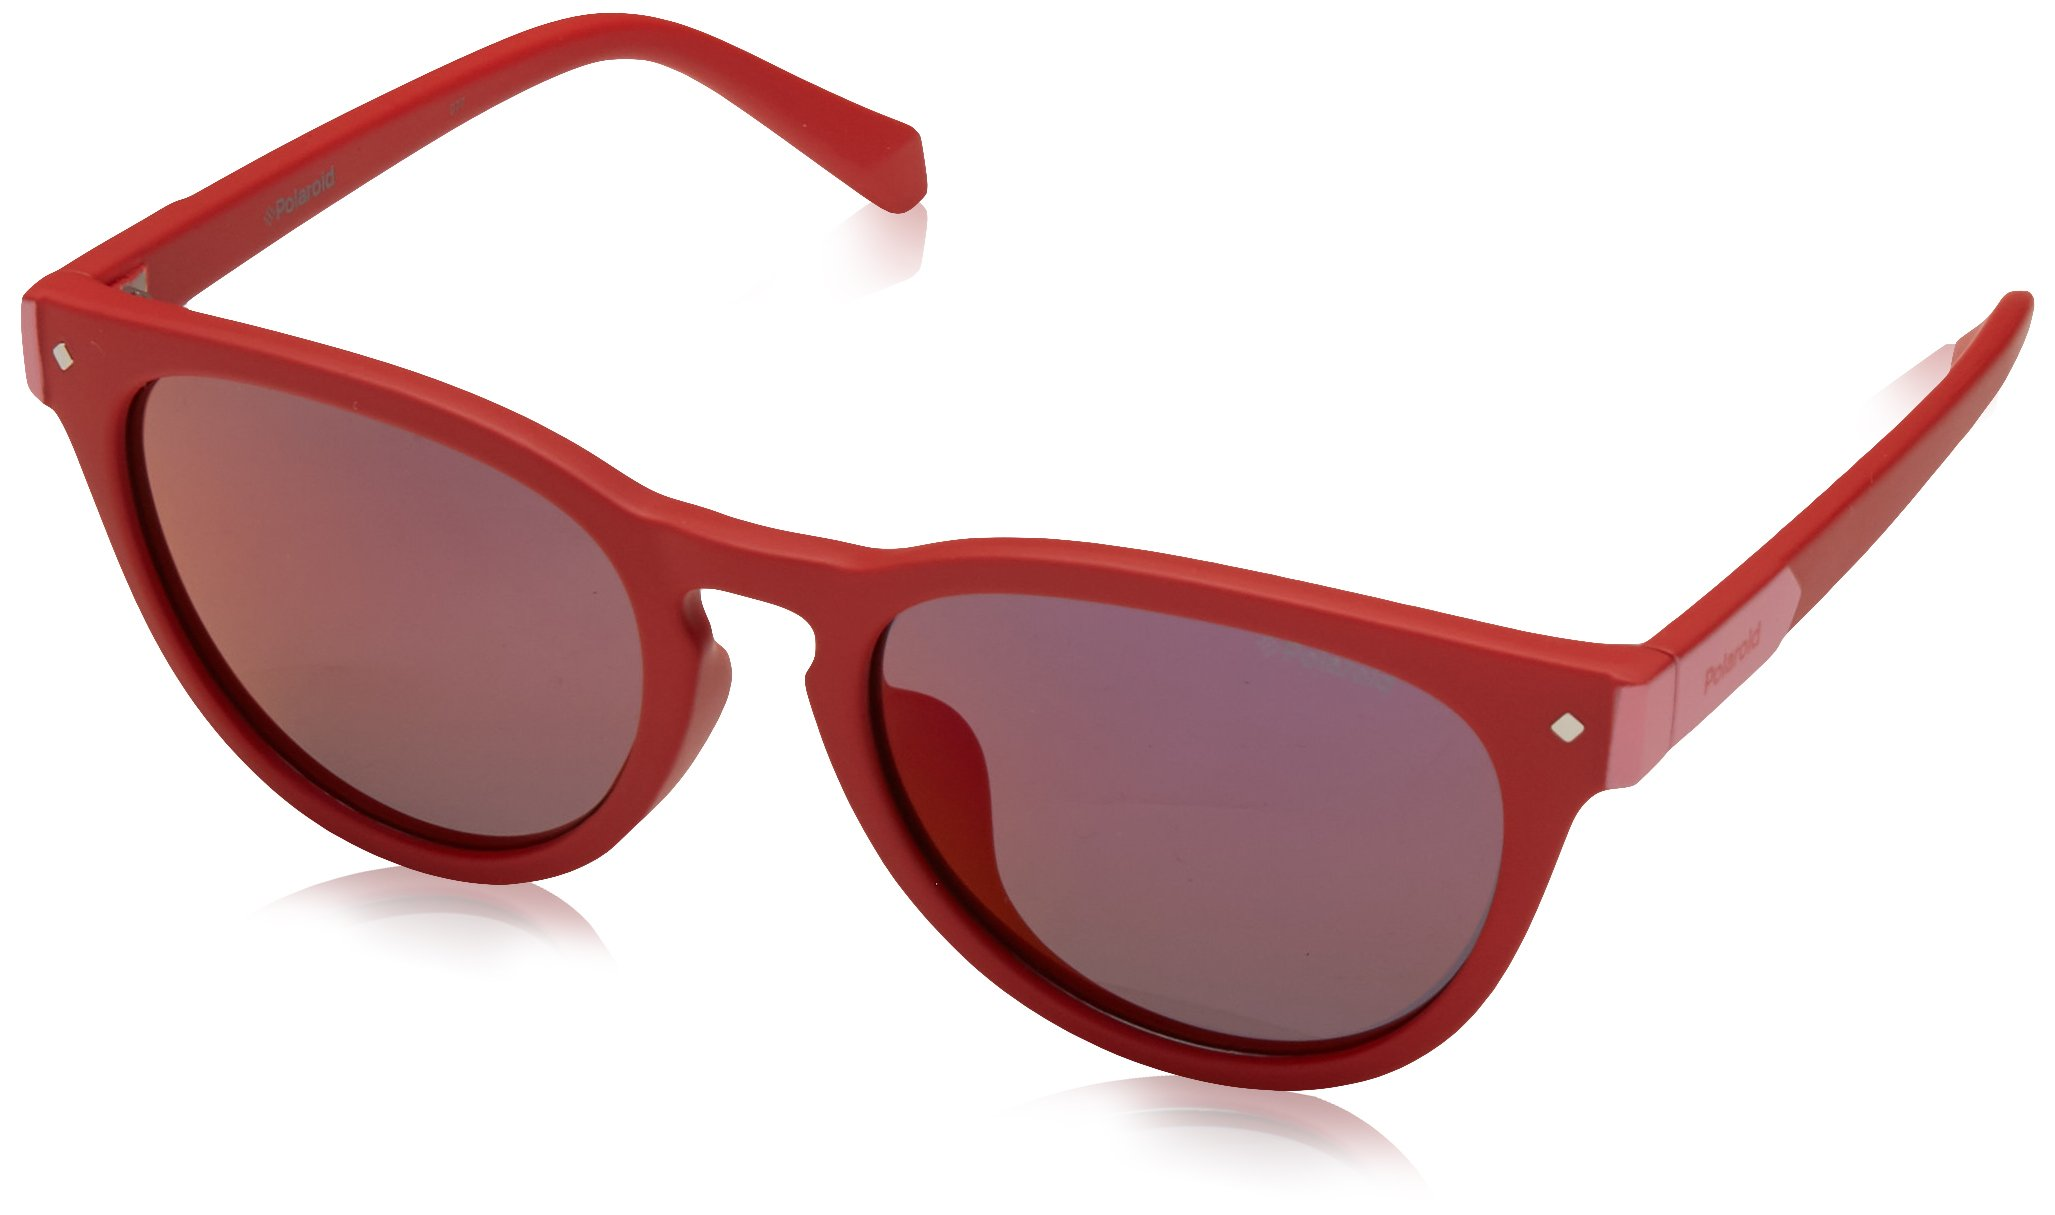 Polaroid Sunglasses Girls' Pld8026fs Polarized Oval Sunglasses, RED, 49 mm by Polaroid Sunglasses (Image #1)